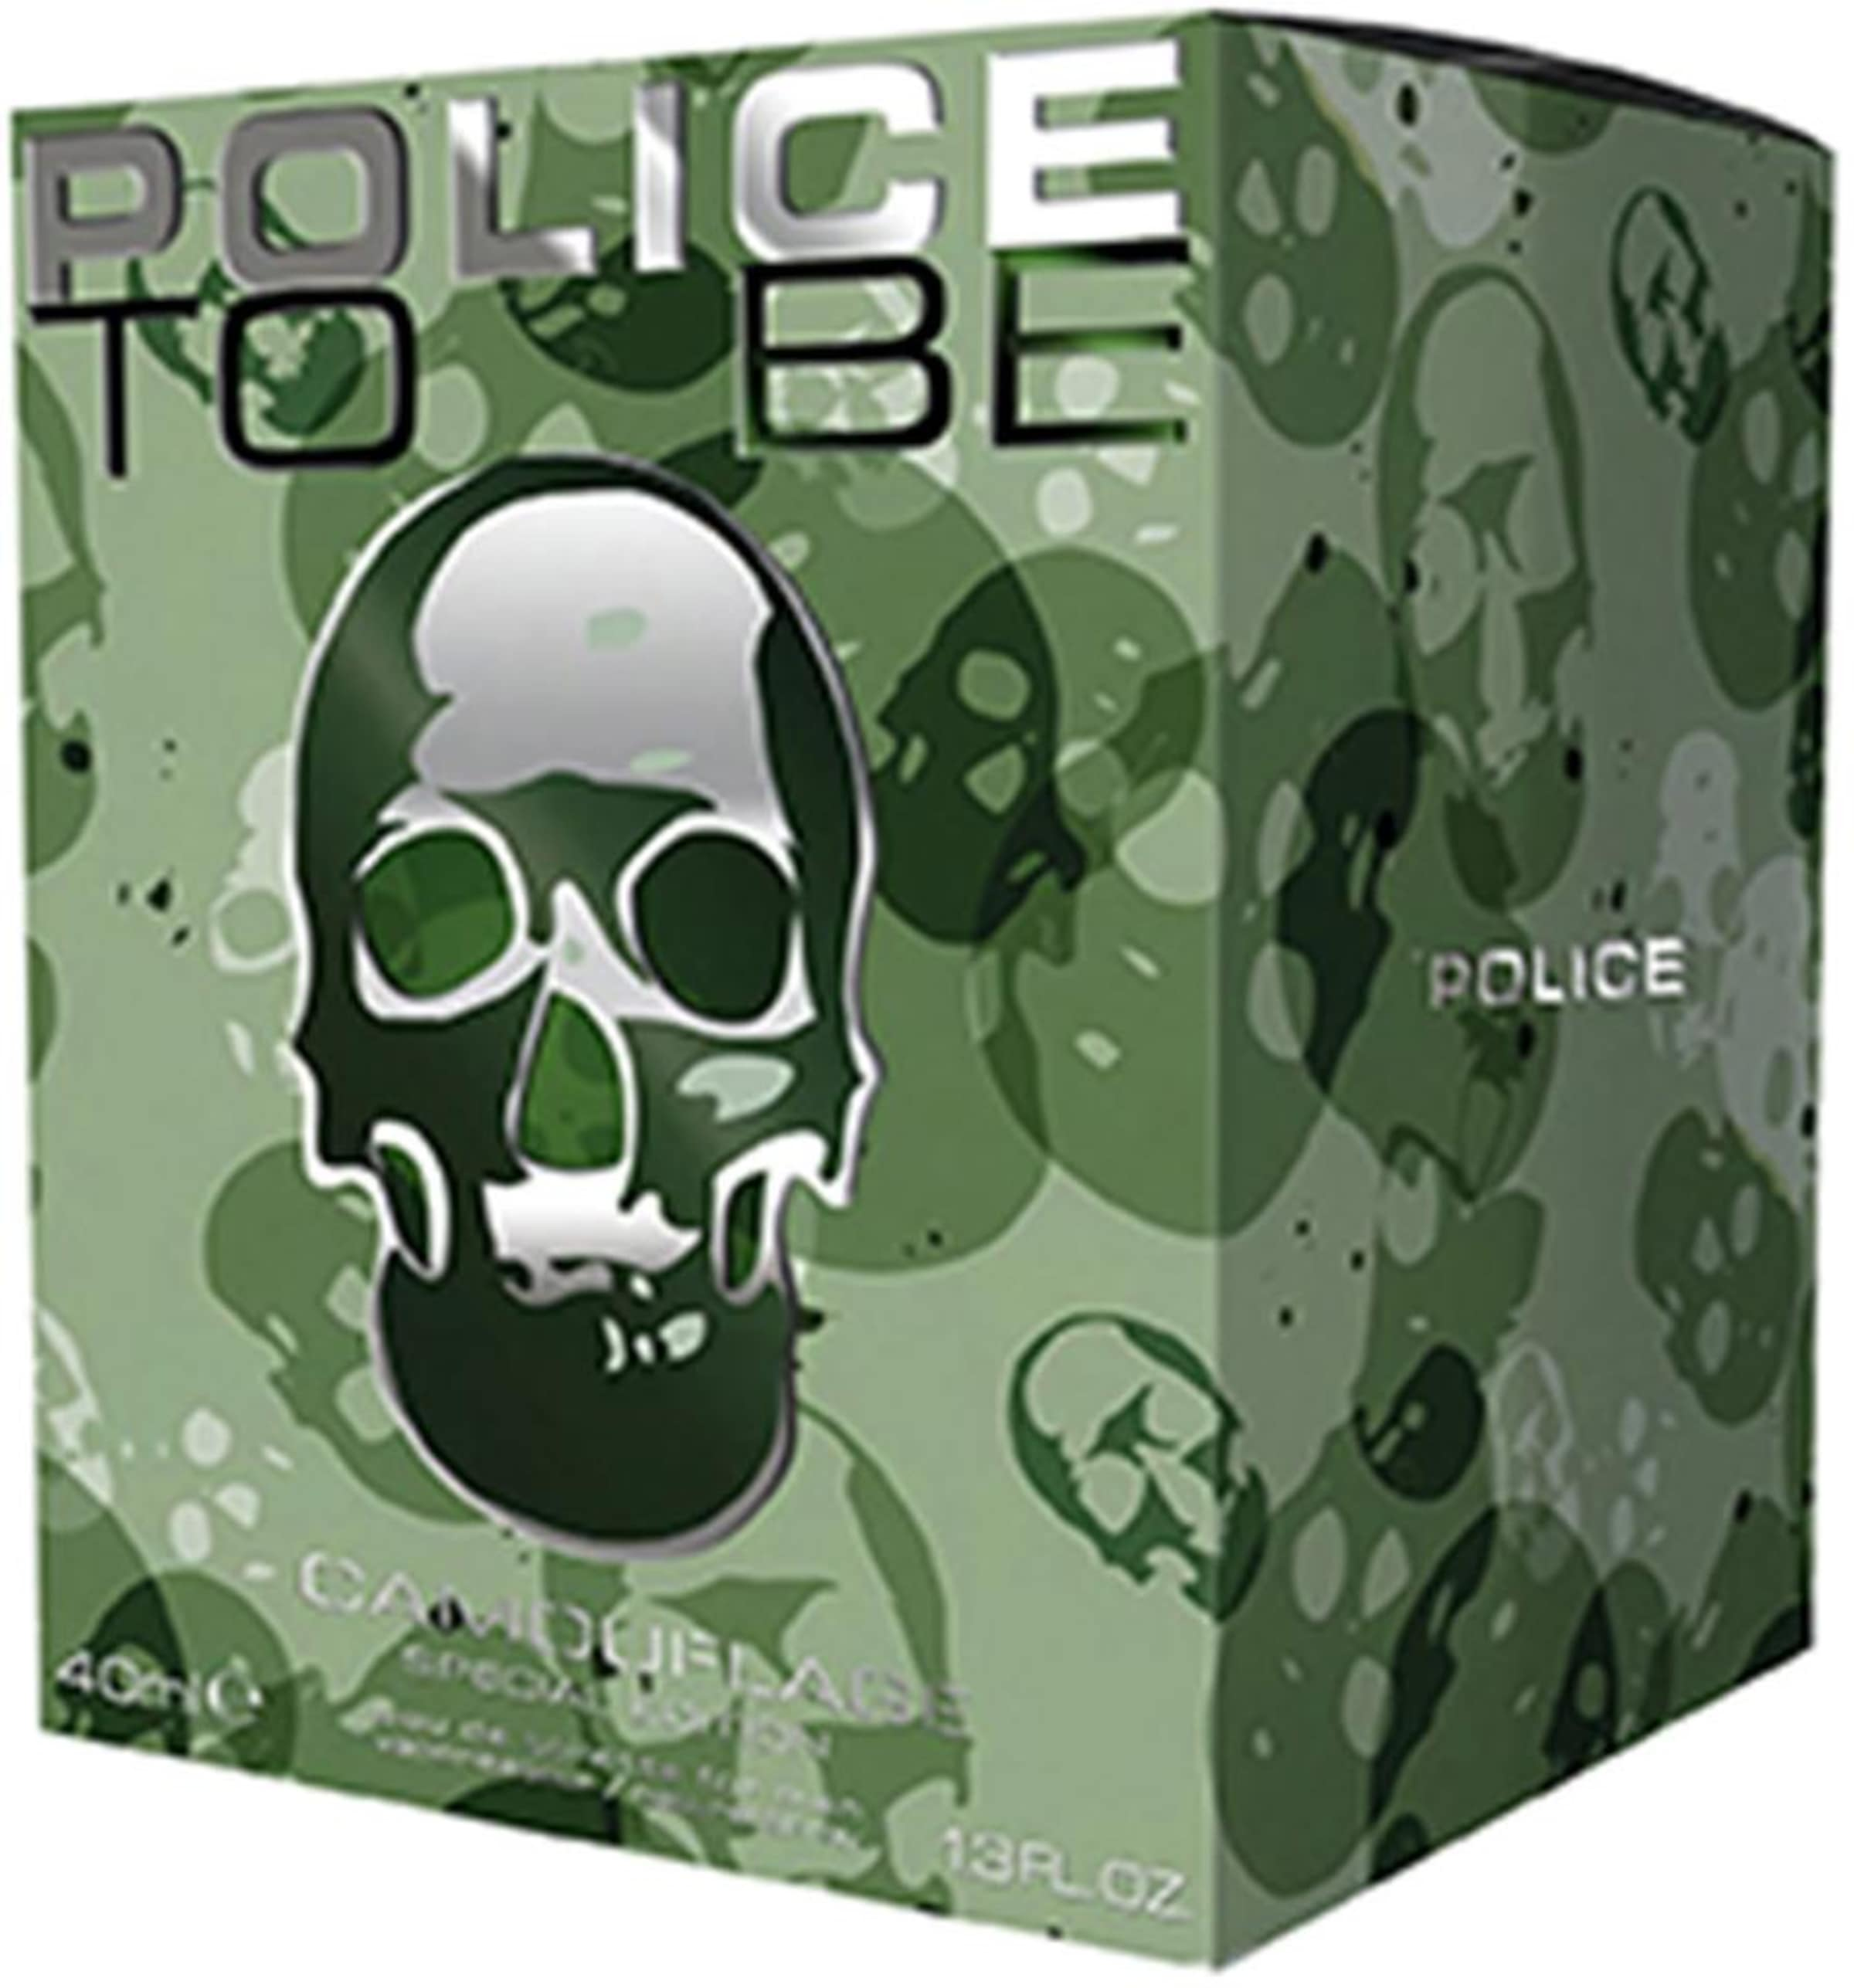 Grasgrün Police 'to Be Eau Camouflage' In De Toilette vfgYb76yI